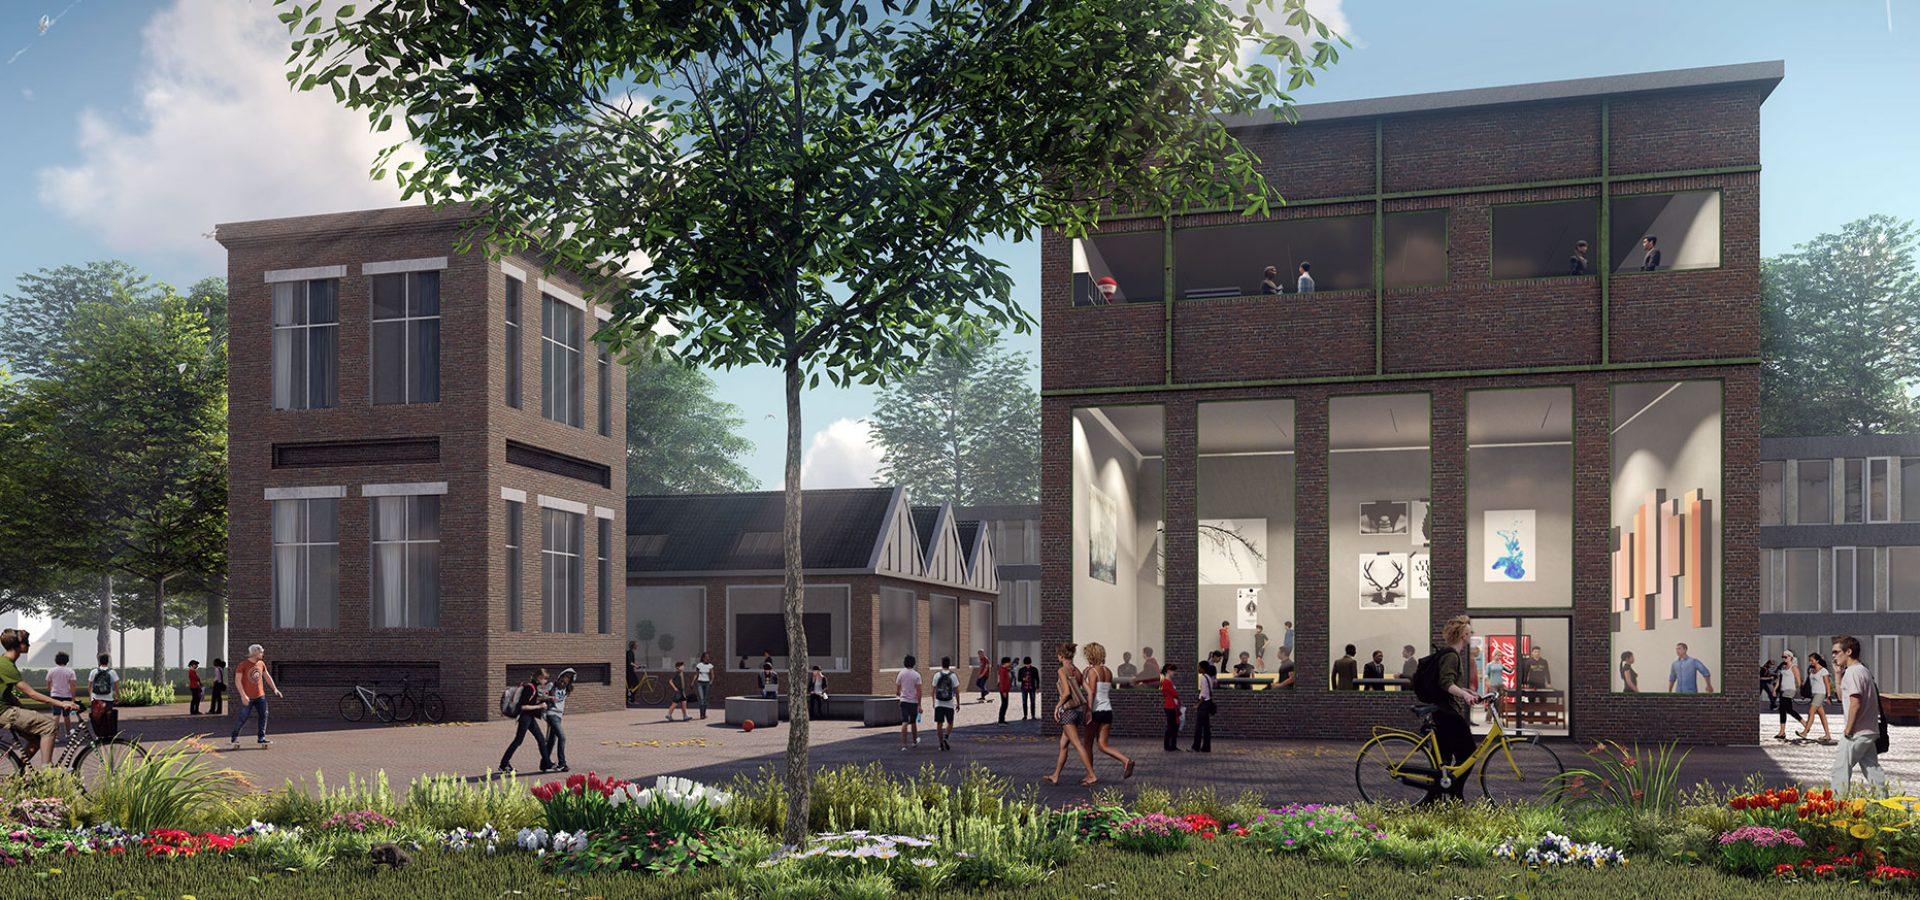 FARO architecten Reggesteyn aan de Regge Nijverdal 04